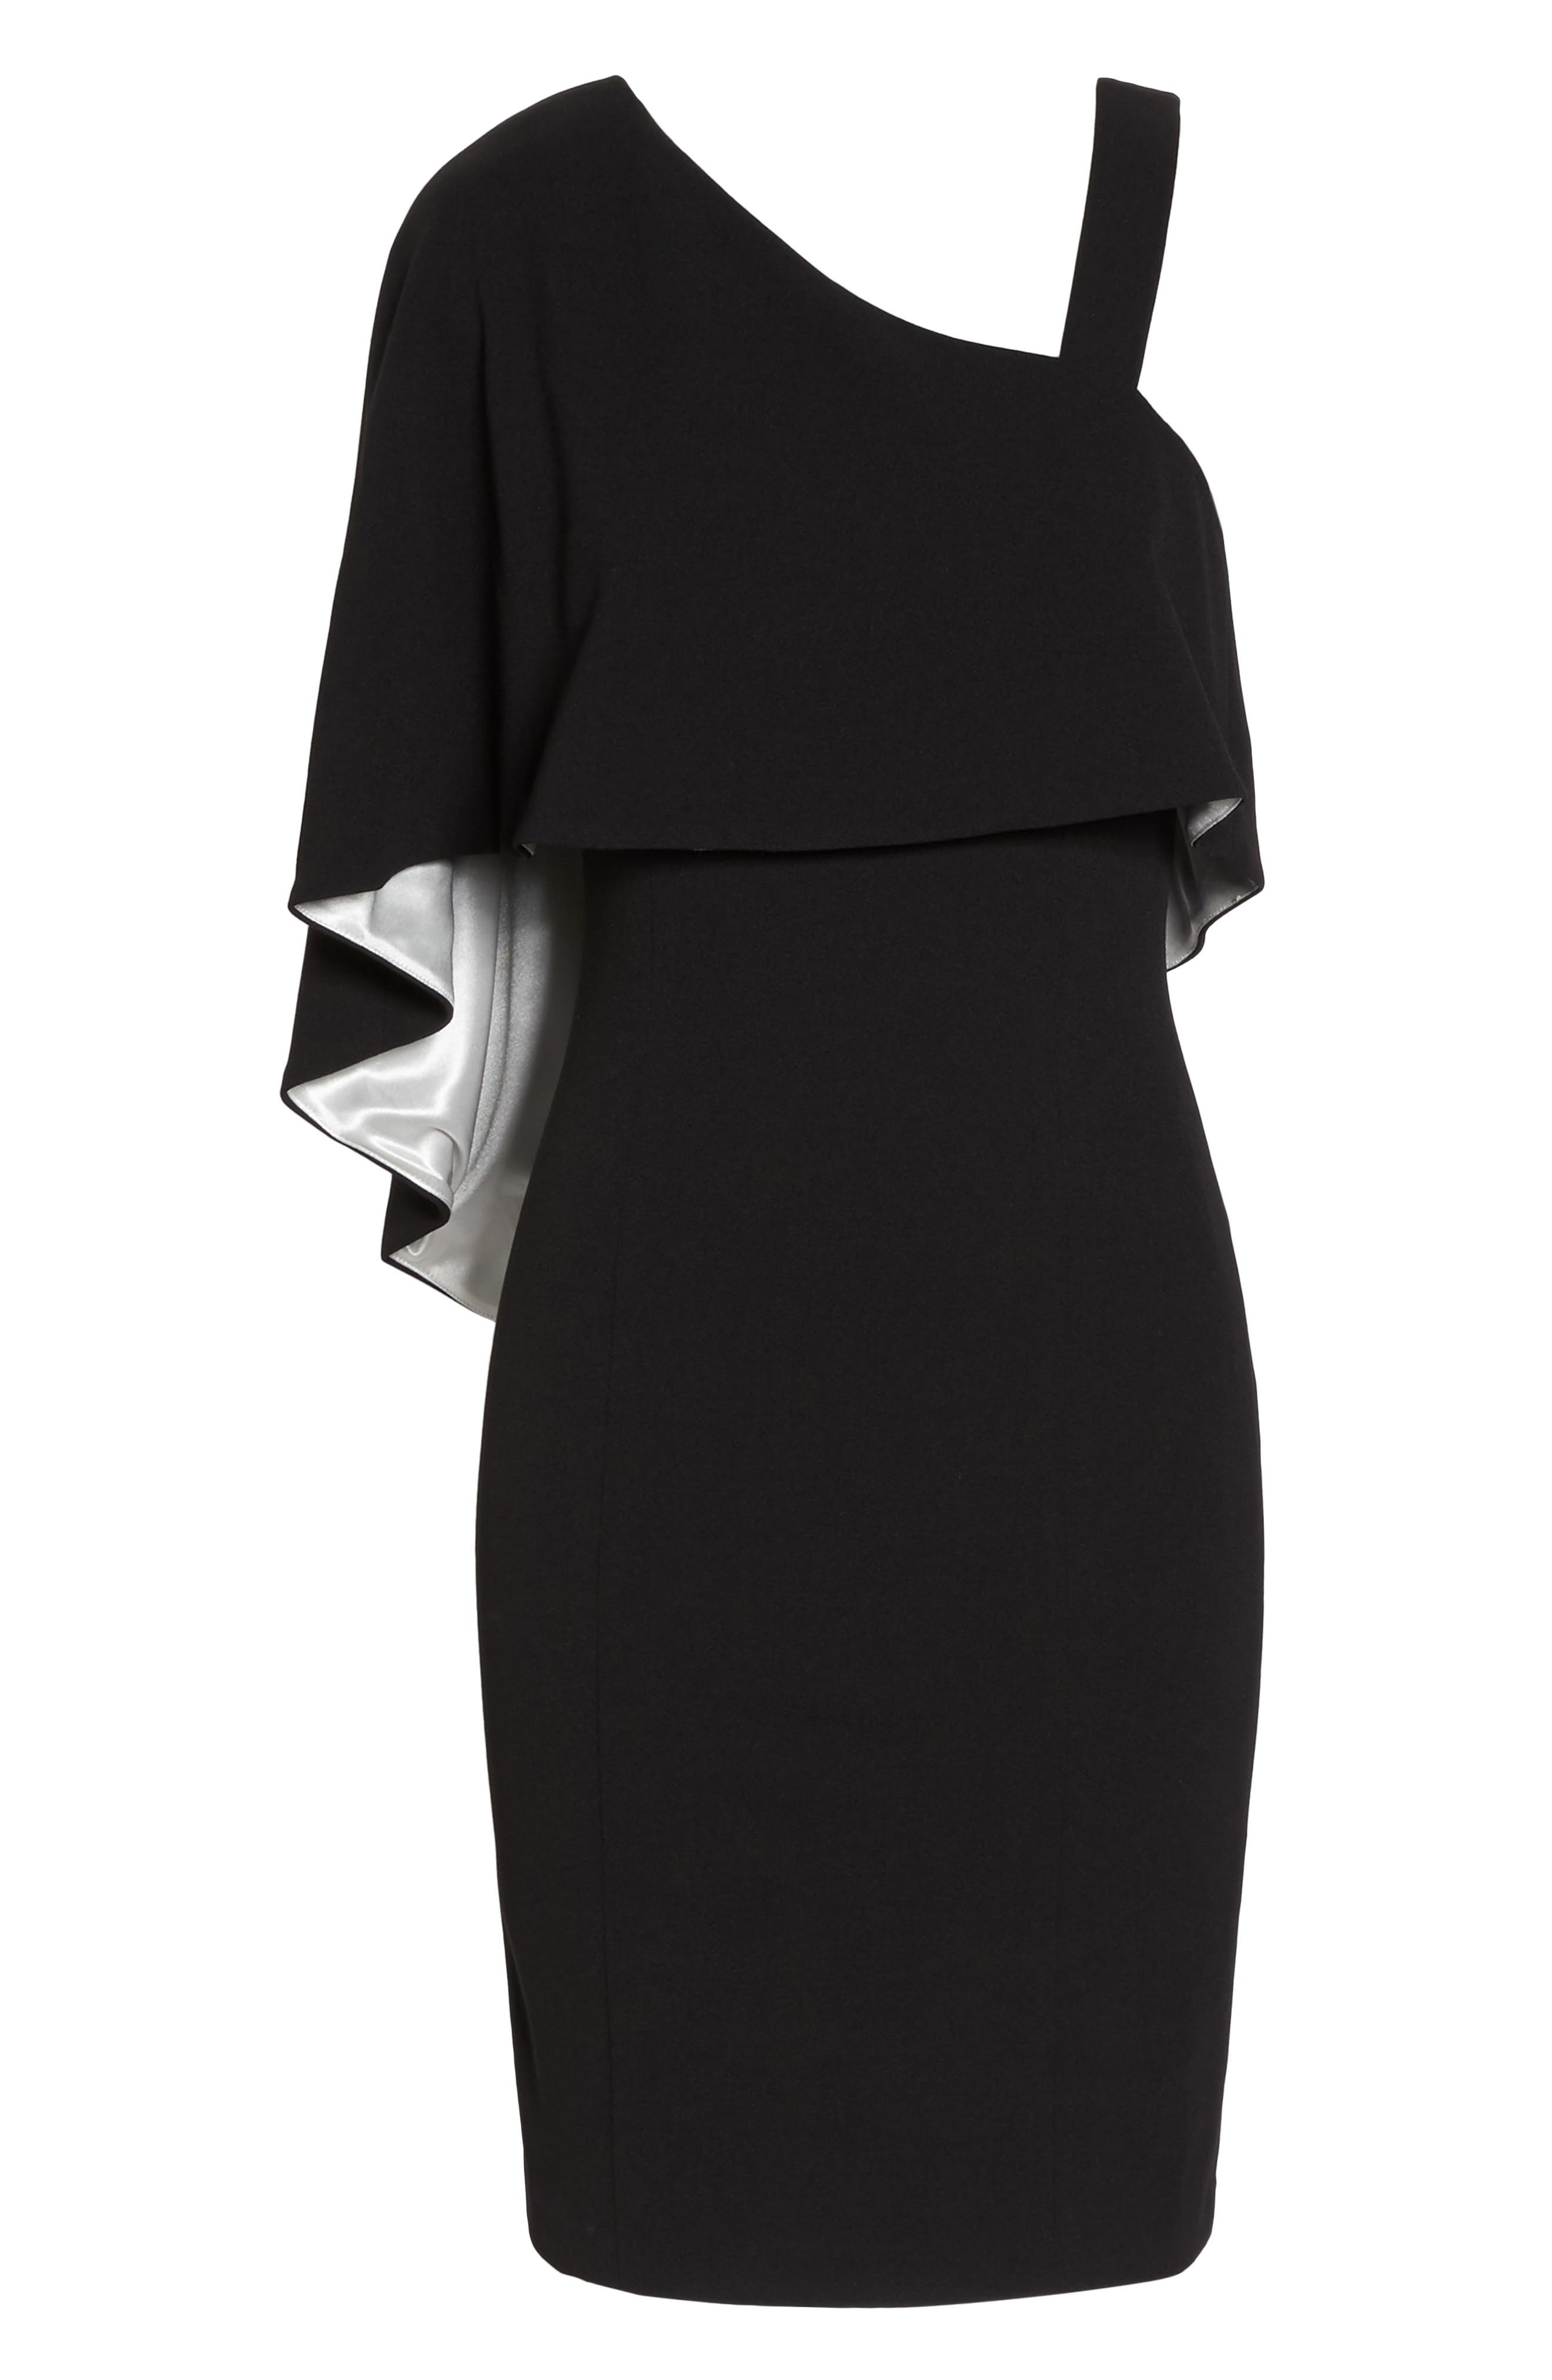 Crepe One-Shoulder Cape Dress,                             Alternate thumbnail 6, color,                             Black/ Ivory